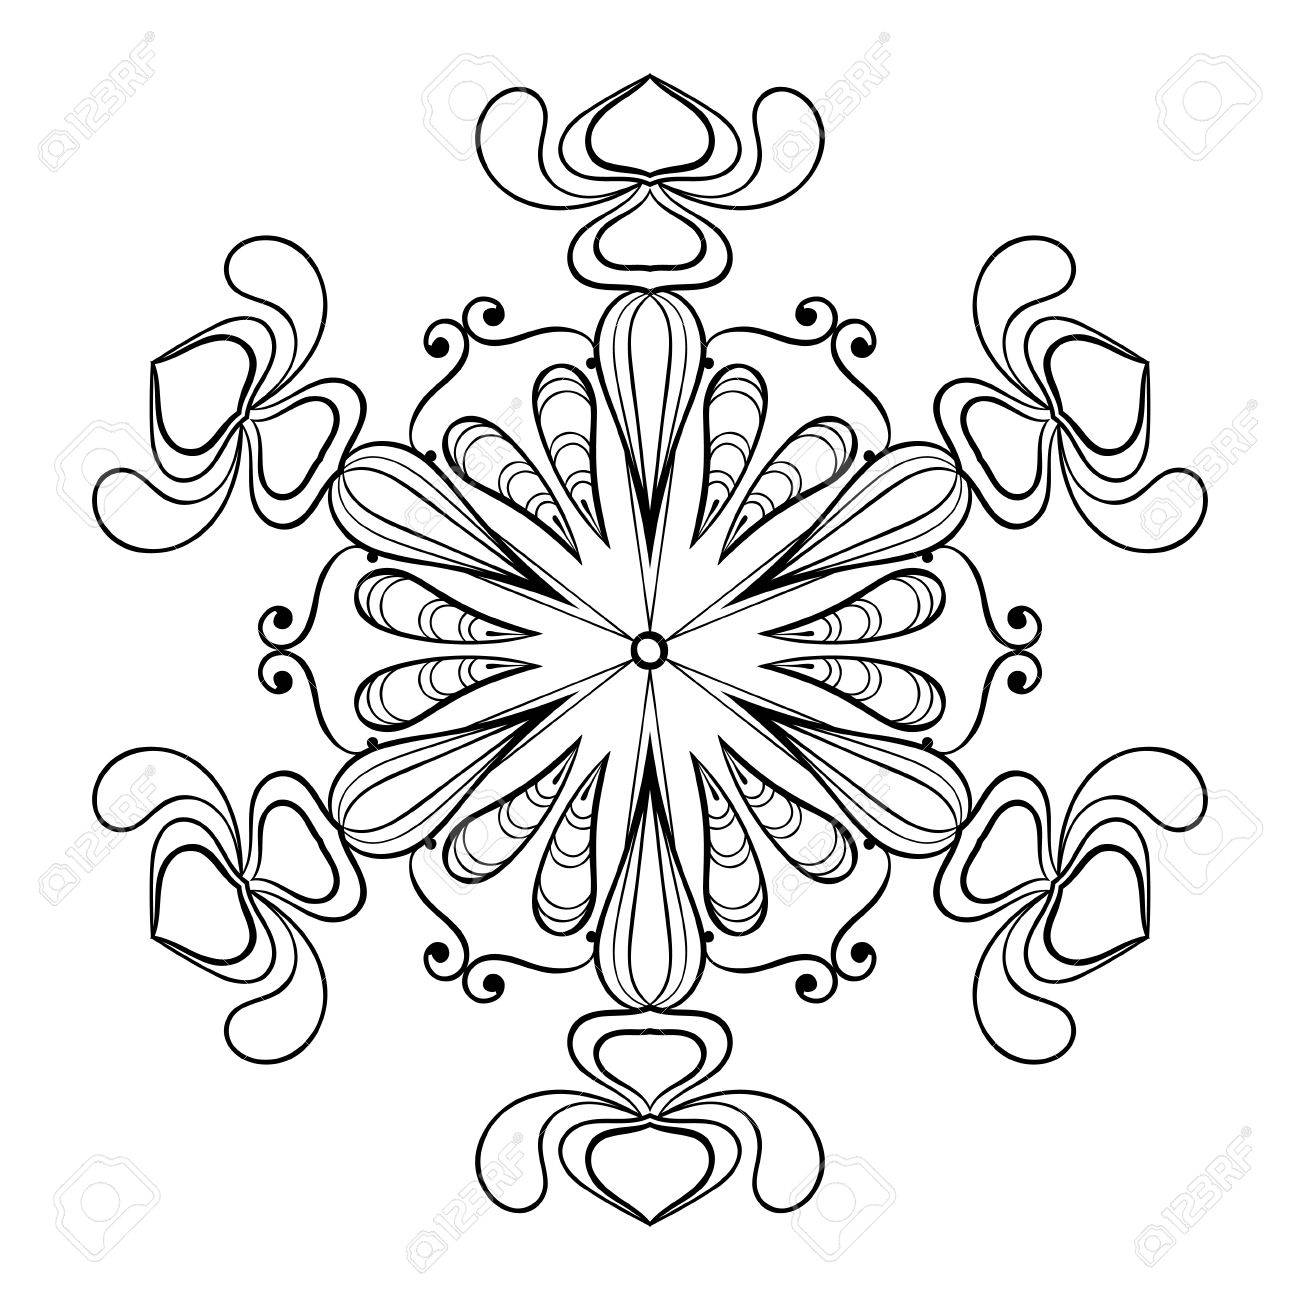 Vector Snow Flake In Zentangle Doodle Style, Vintage Mandala ...